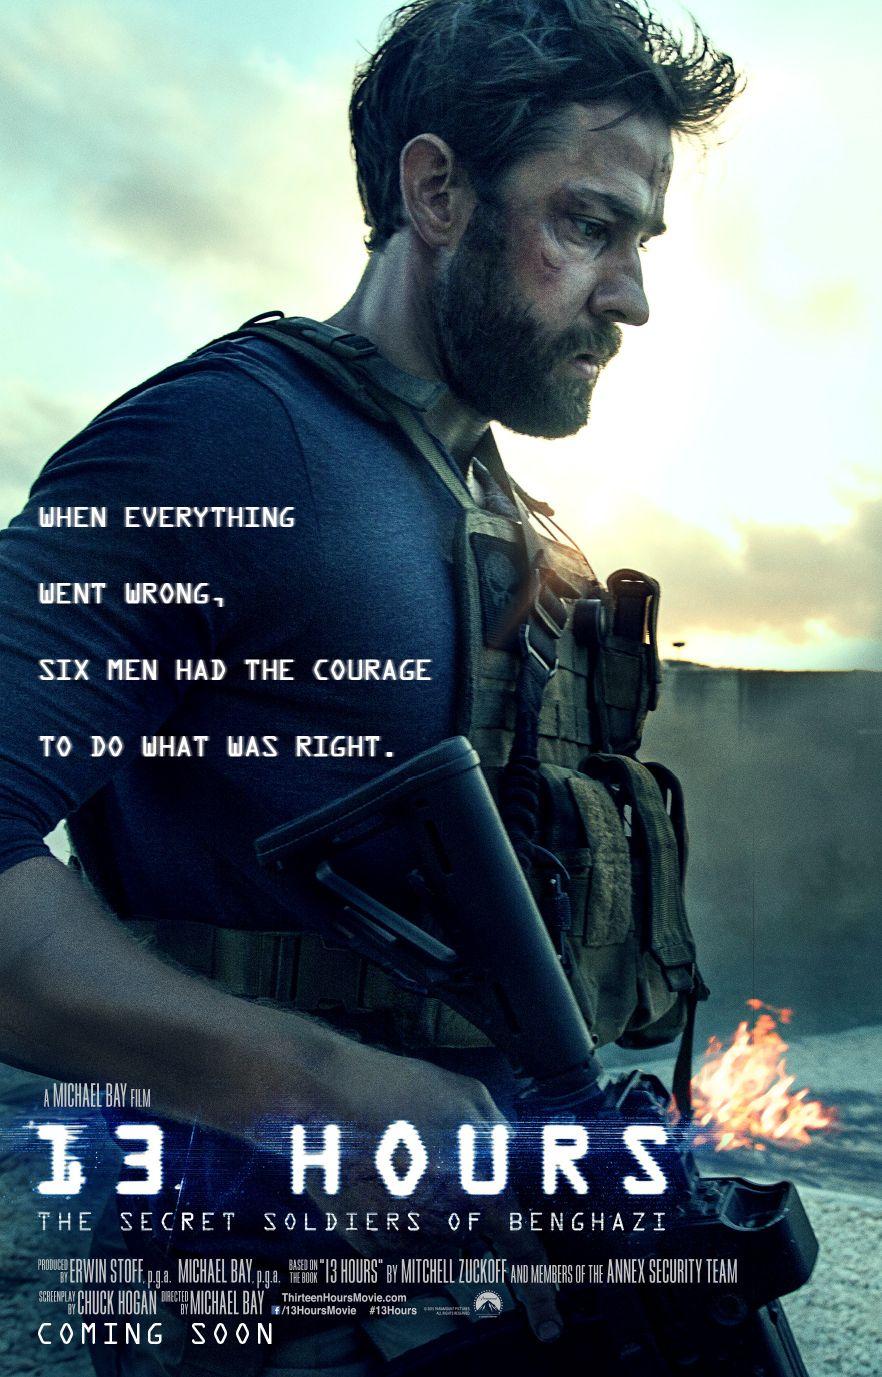 13 hours in benghazi full movie online free